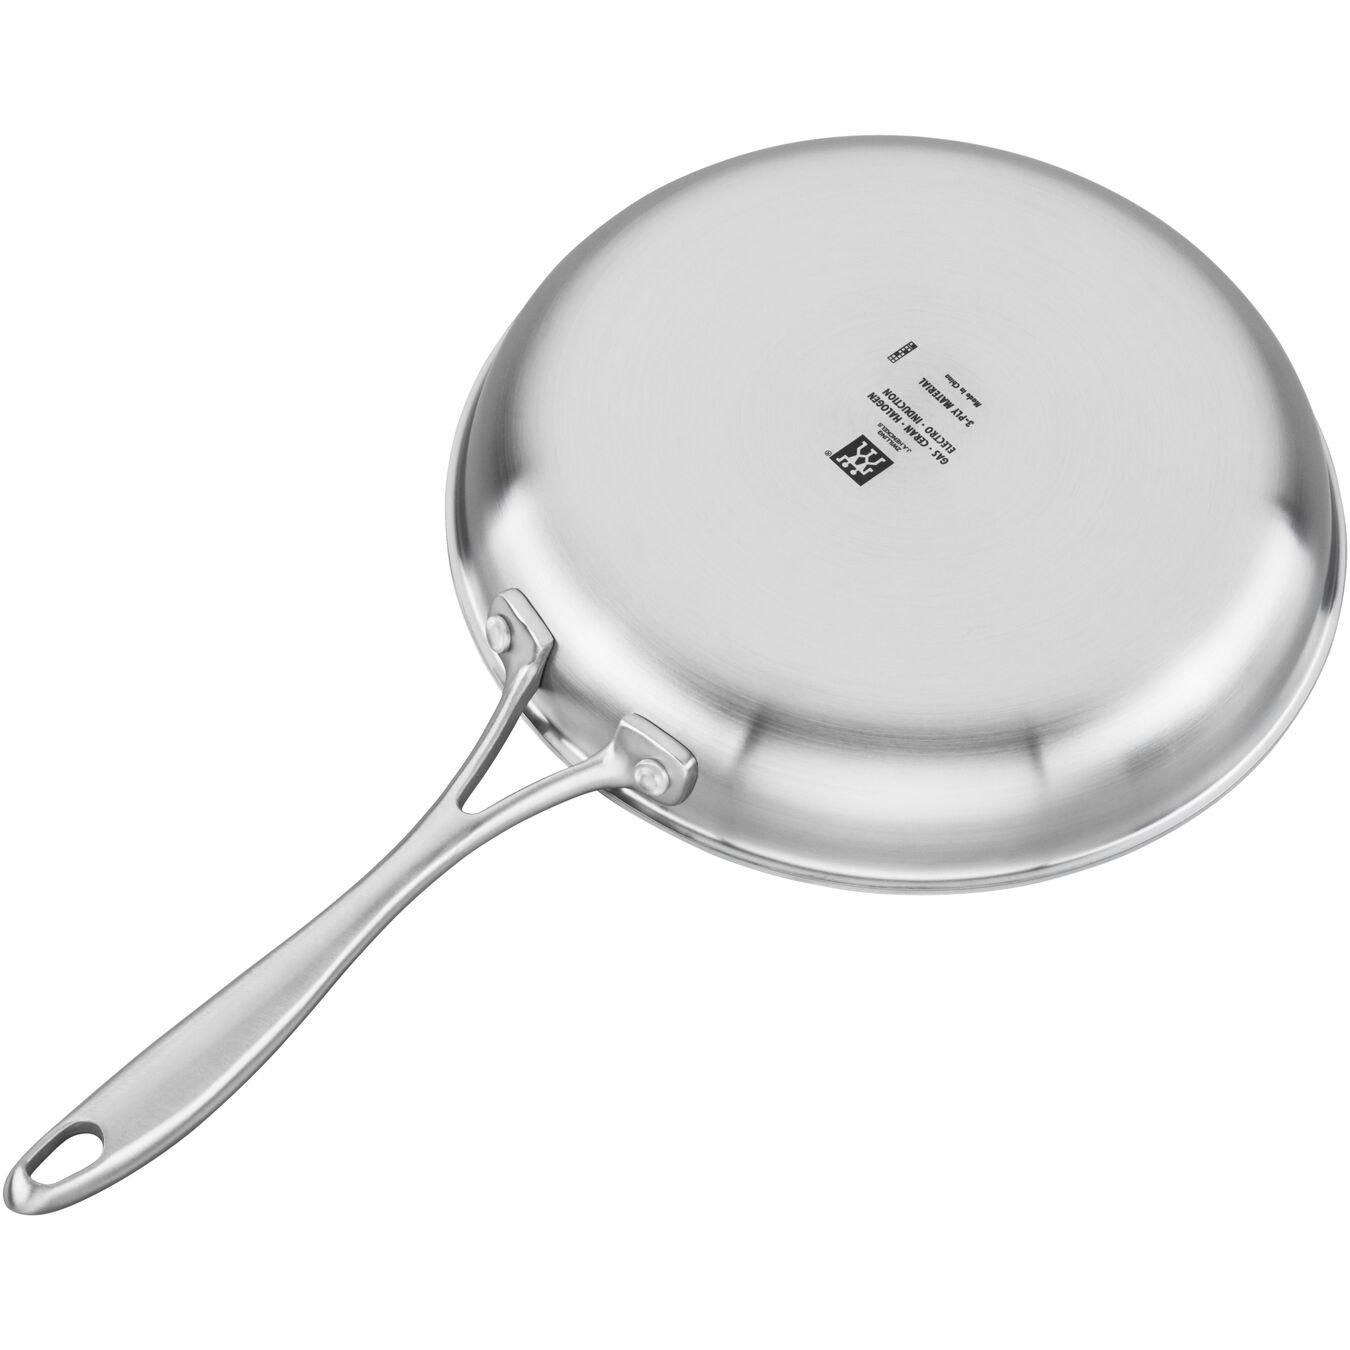 2-pc, stainless steel, Frying pan set,,large 6